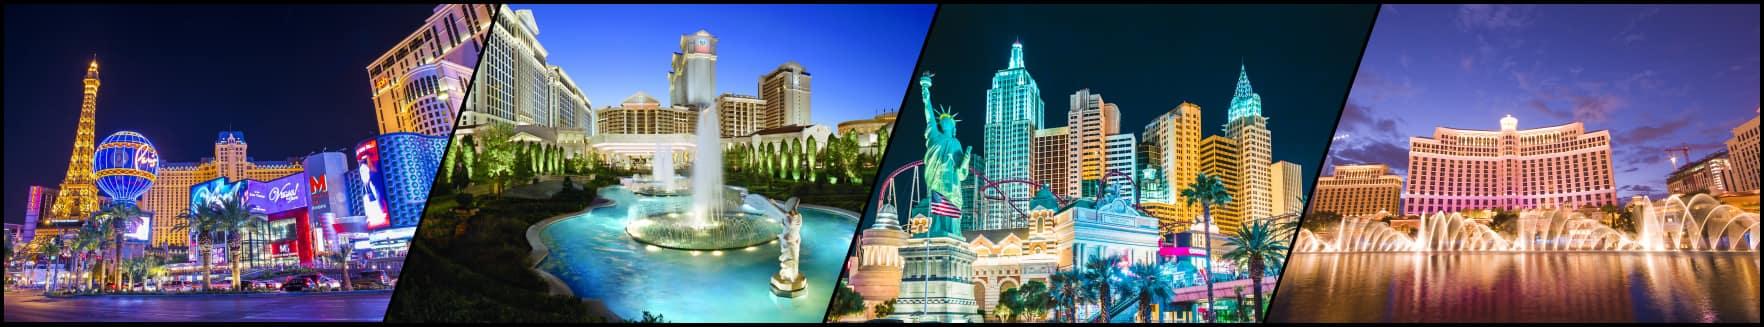 Las Vegas Tour